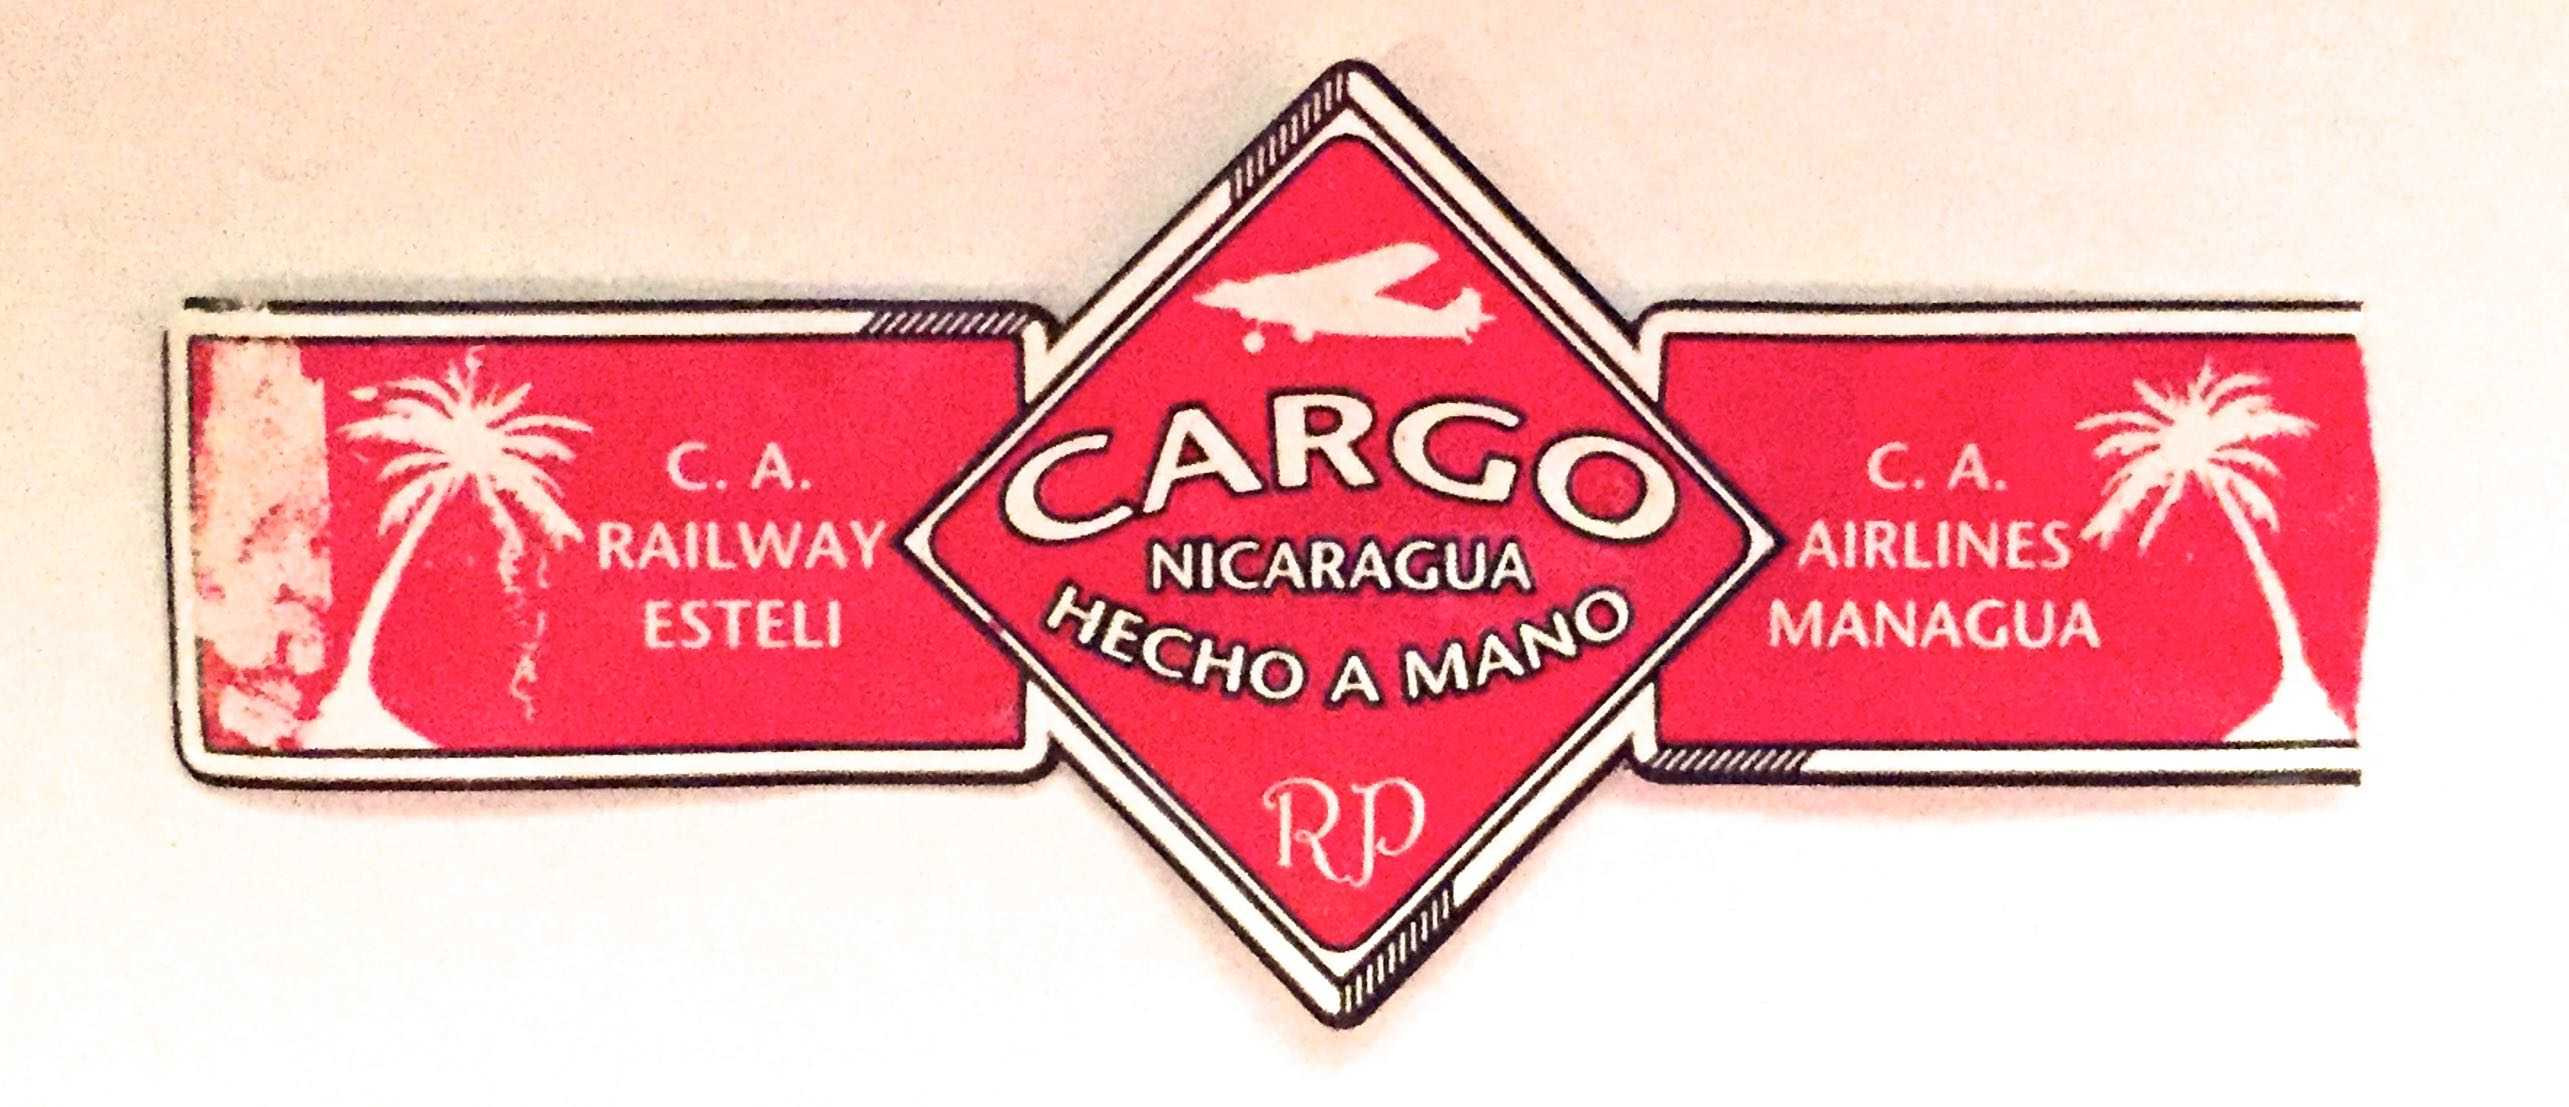 rocky-patel-cargo-logo.jpg